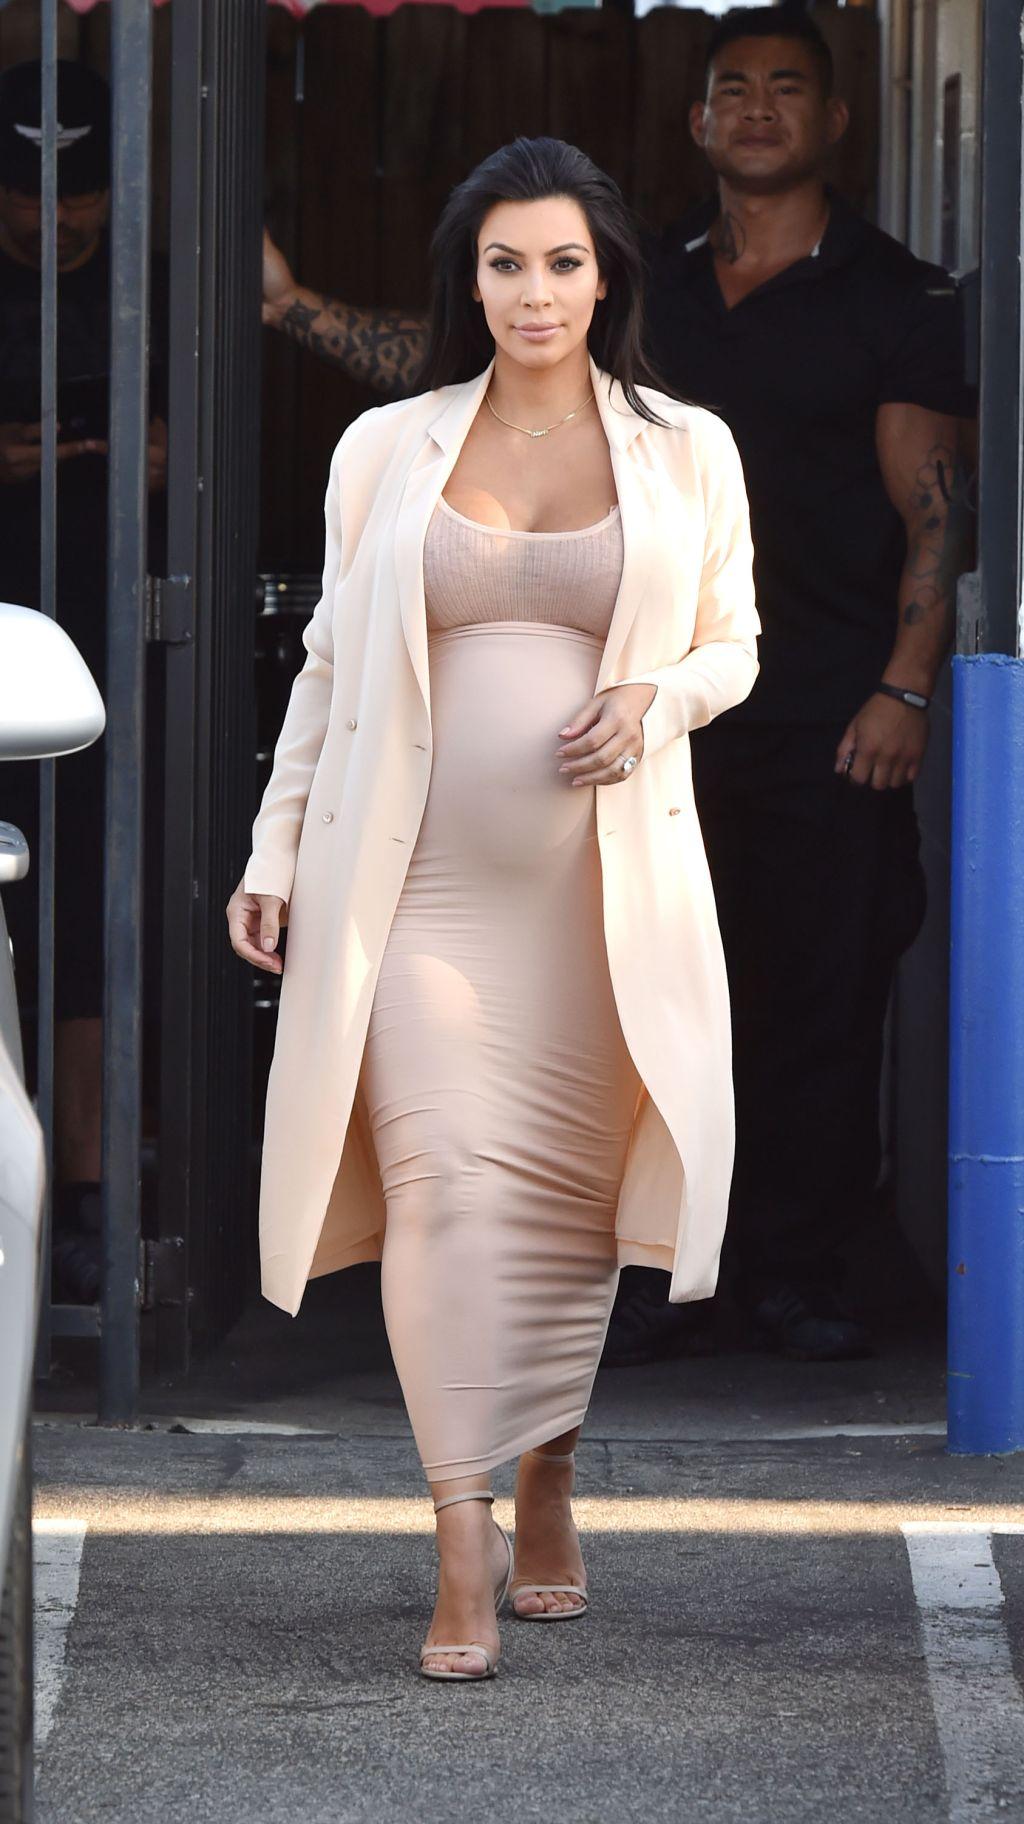 A pregnant Kim Kardashian leaves the studio